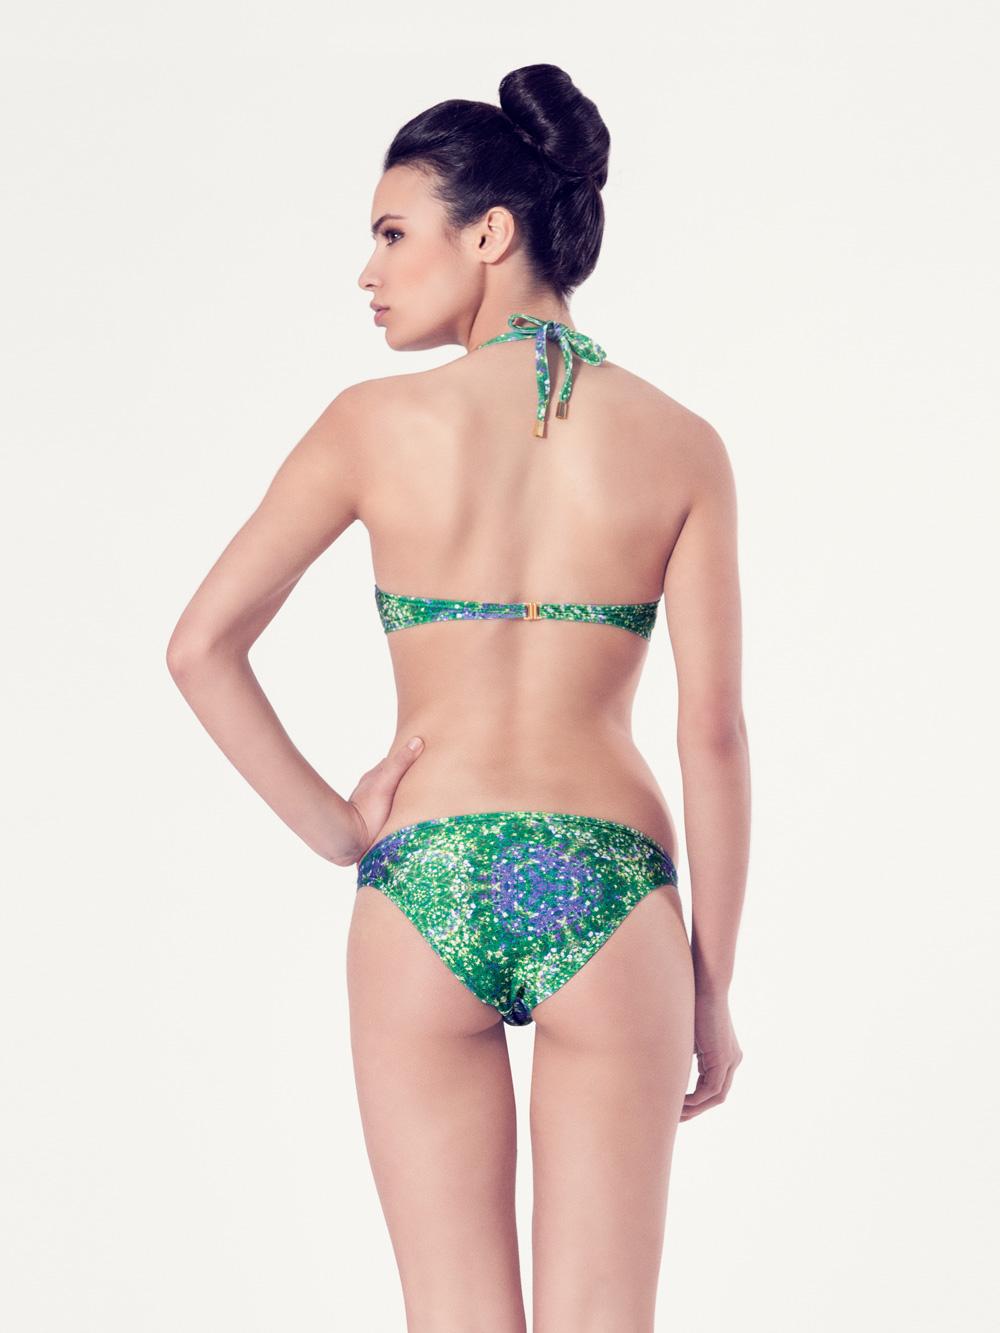 PERSICARIA Bikini básico - Vista trasera - Estampado verde - nadadora.com.es - swimwear